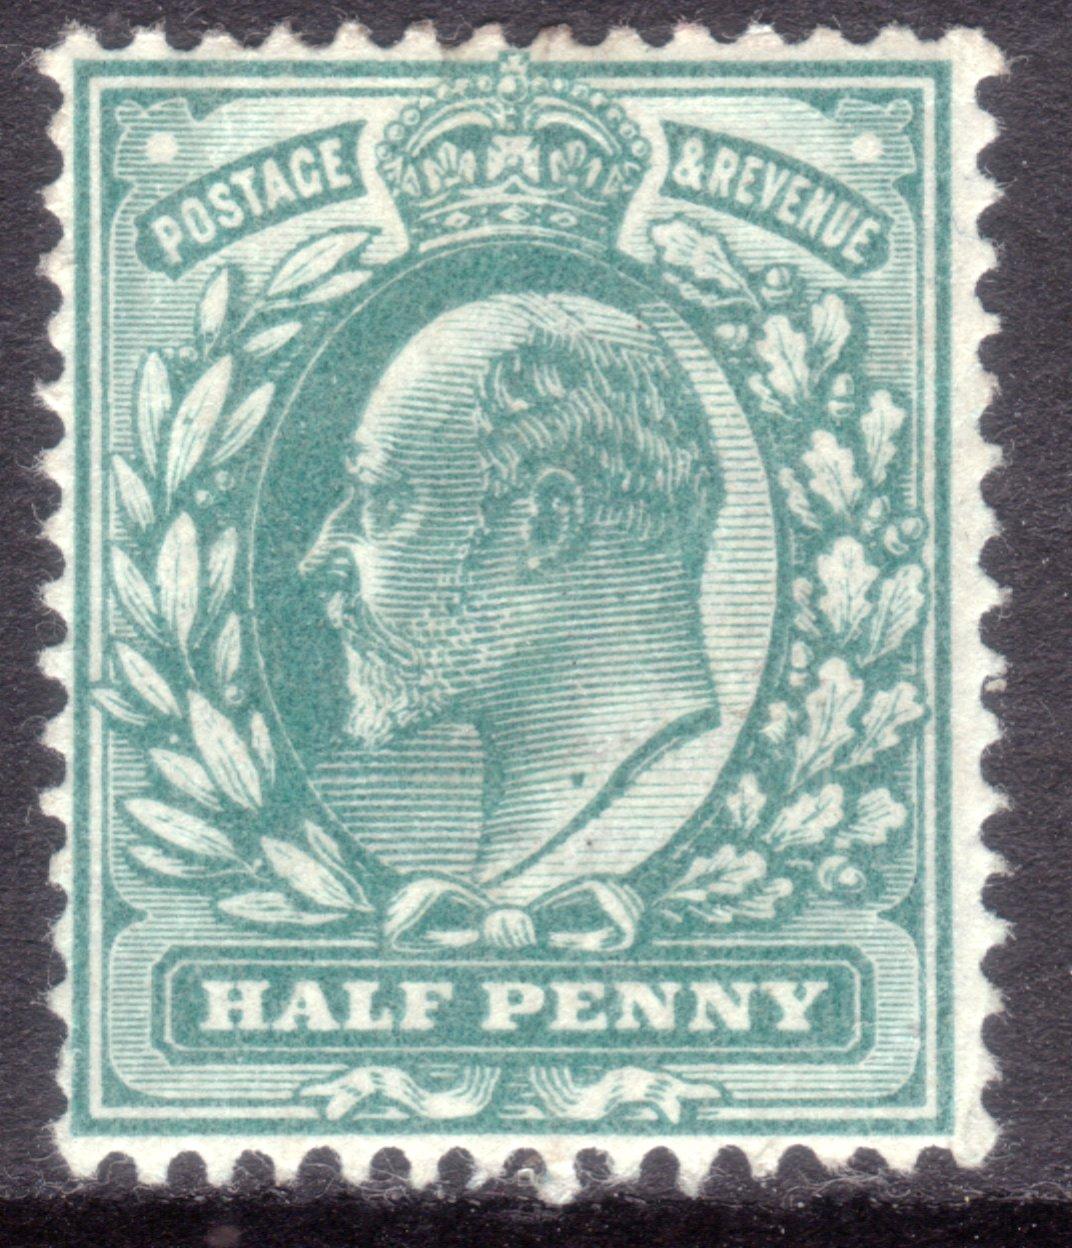 1902 ½d Blue-green Mint Variety